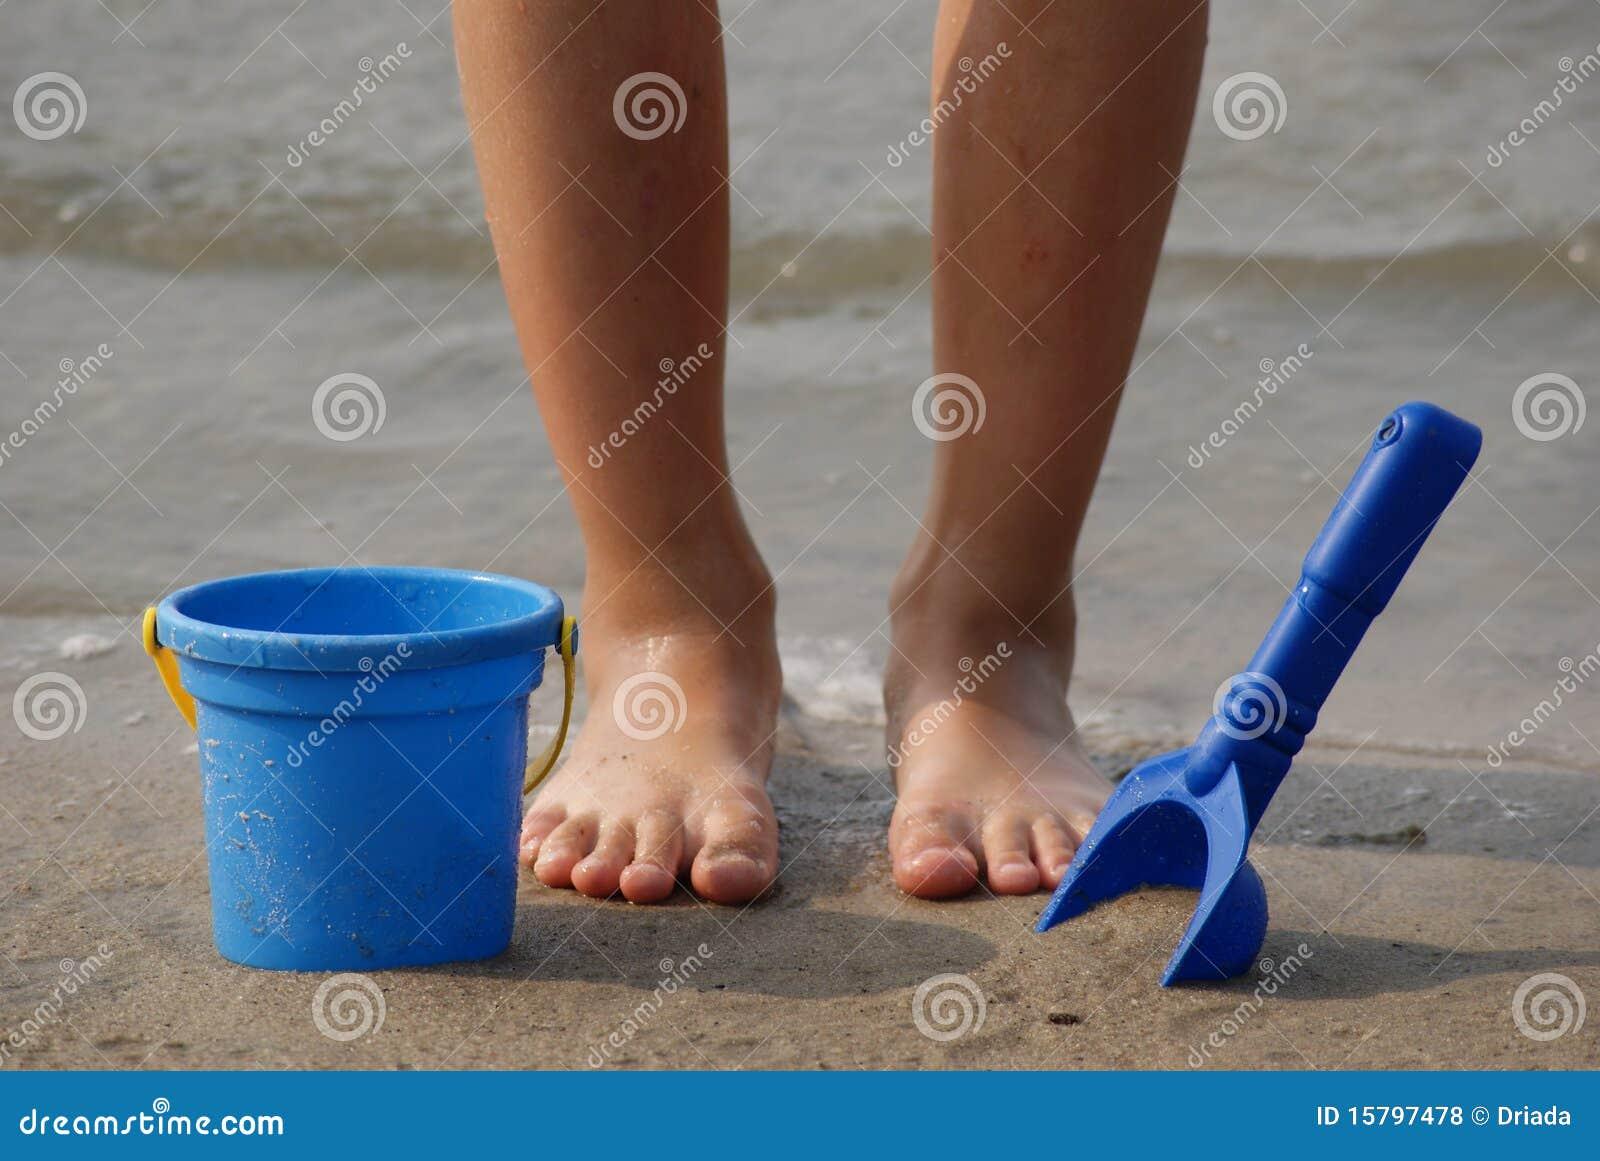 Toys For Feet : Children s feet with beach toys royalty free stock photos